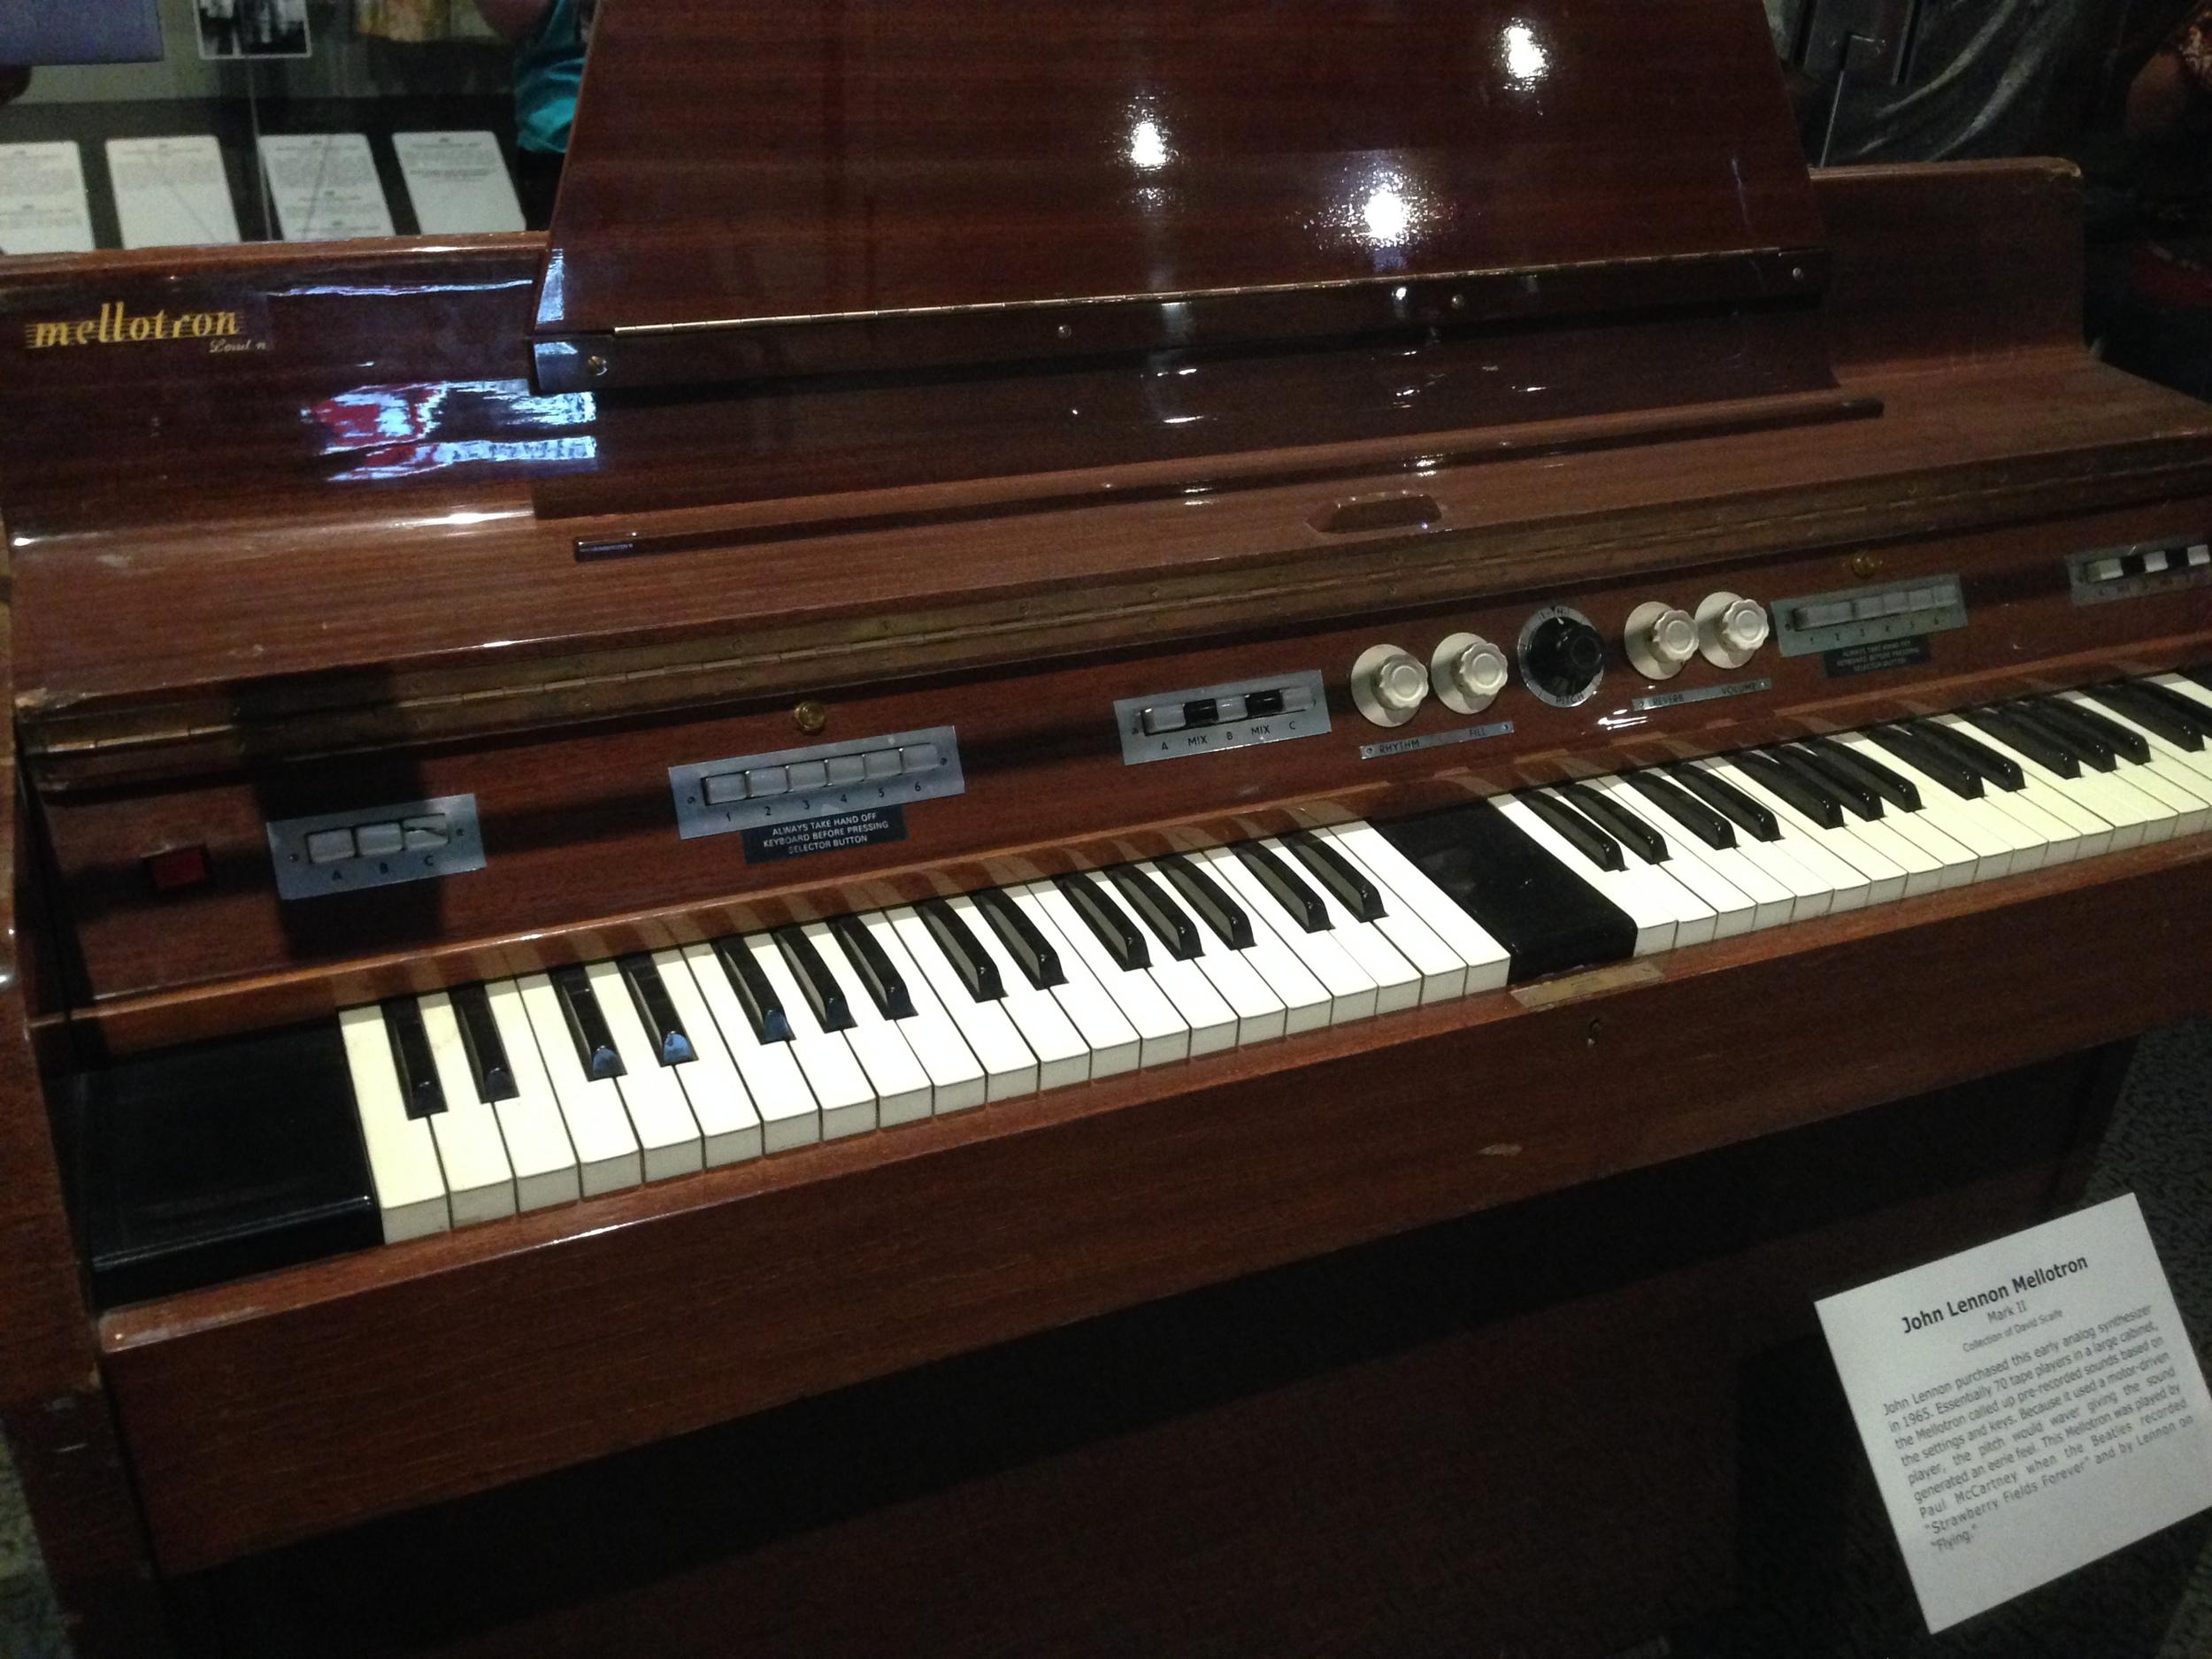 John Lennon's Mellotron